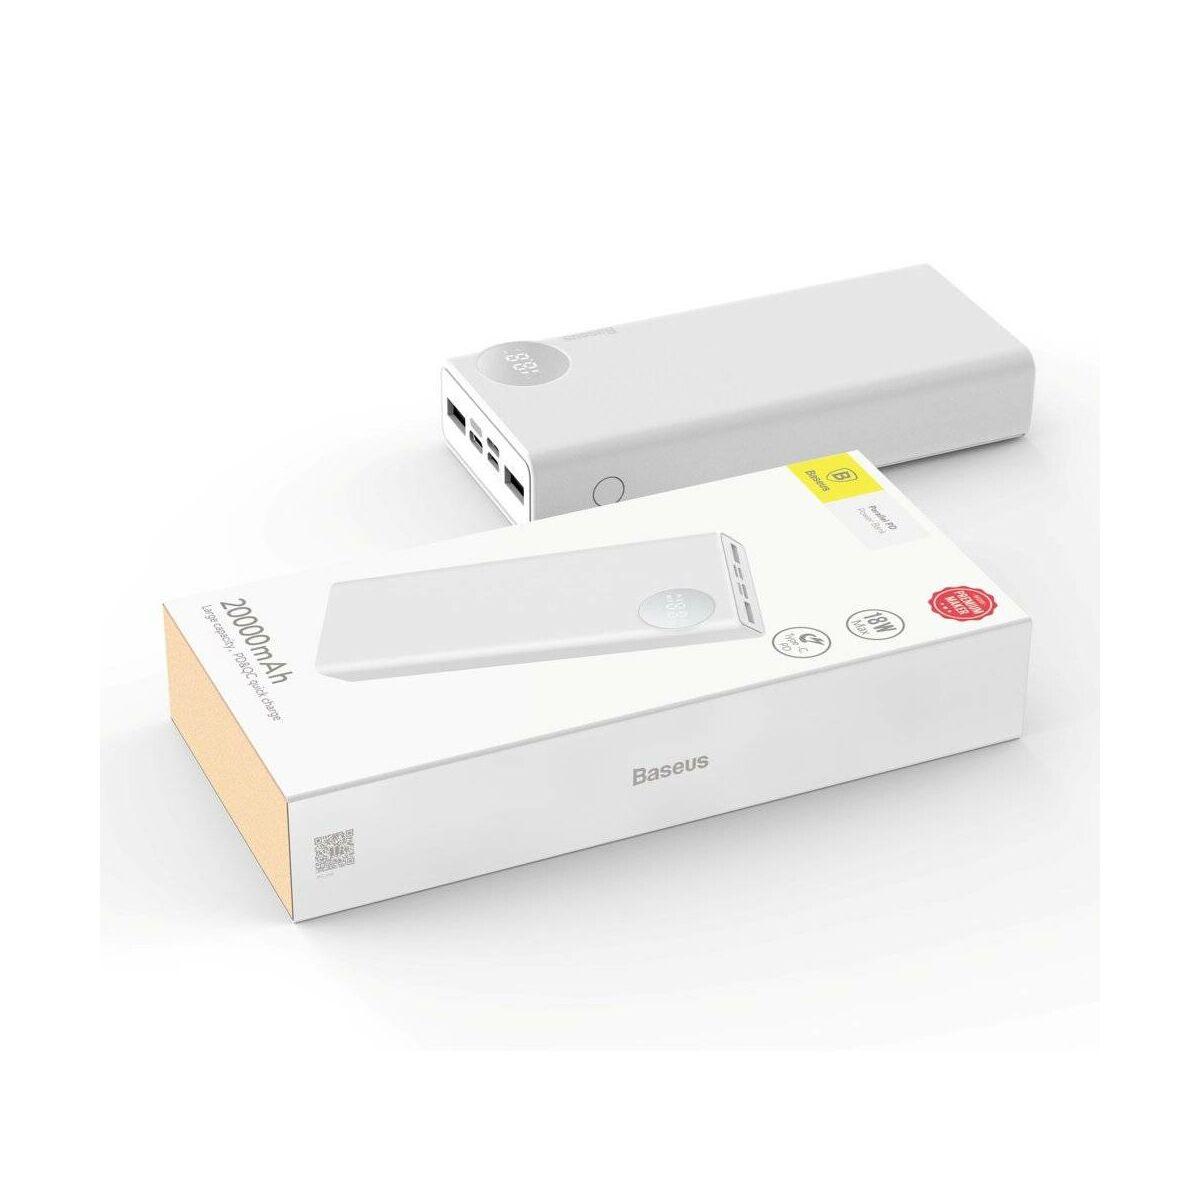 Baseus Power Bank Mulight, PD gyors töltés (Micro USB + Type-C + Lightning bem. / 2xUSB + Type-C PD kim.), 3A, 20.000 mAh, fehér (PPALL-MY02